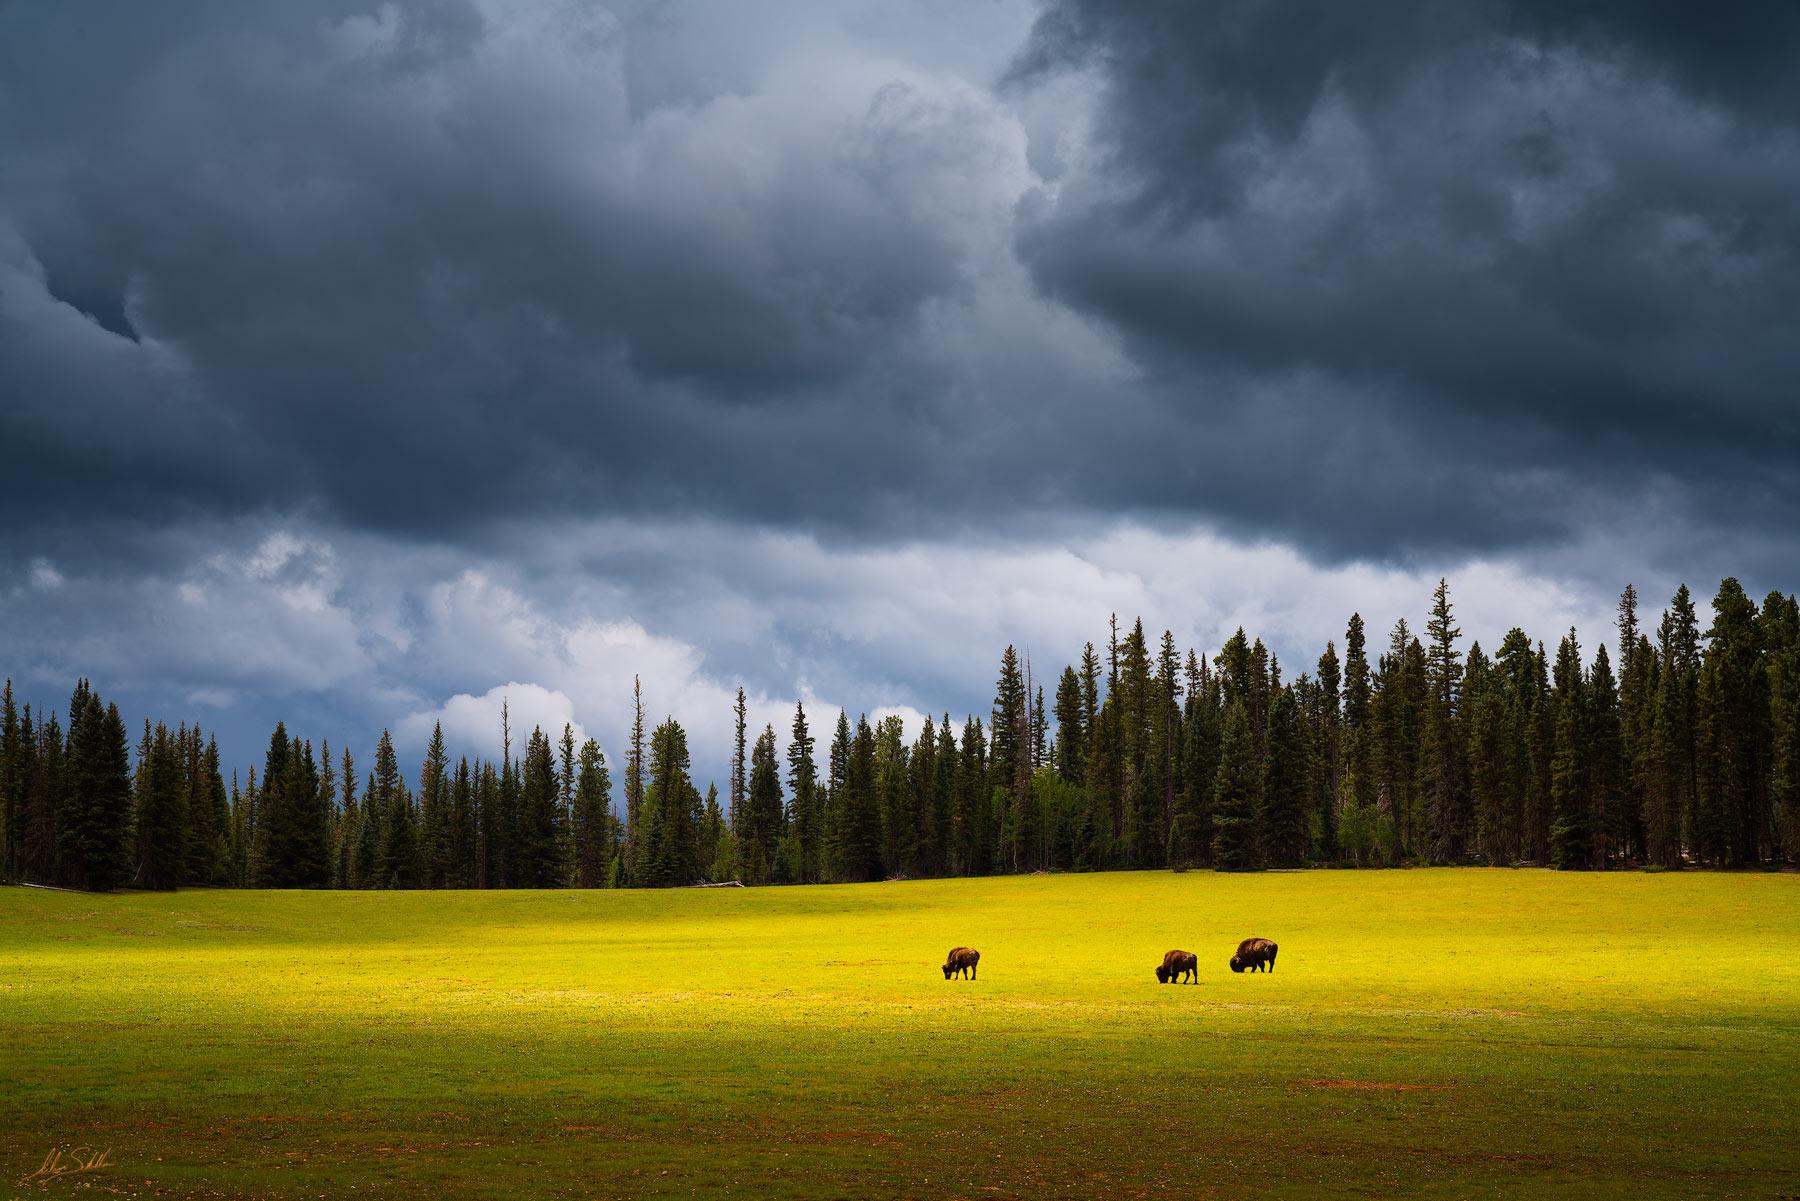 America, Animal, Arizona, Bison, Buffalo, Colorado Plateau, Grand Canyon, Meadow, Monsoon, National Park, North Rim, green, photo